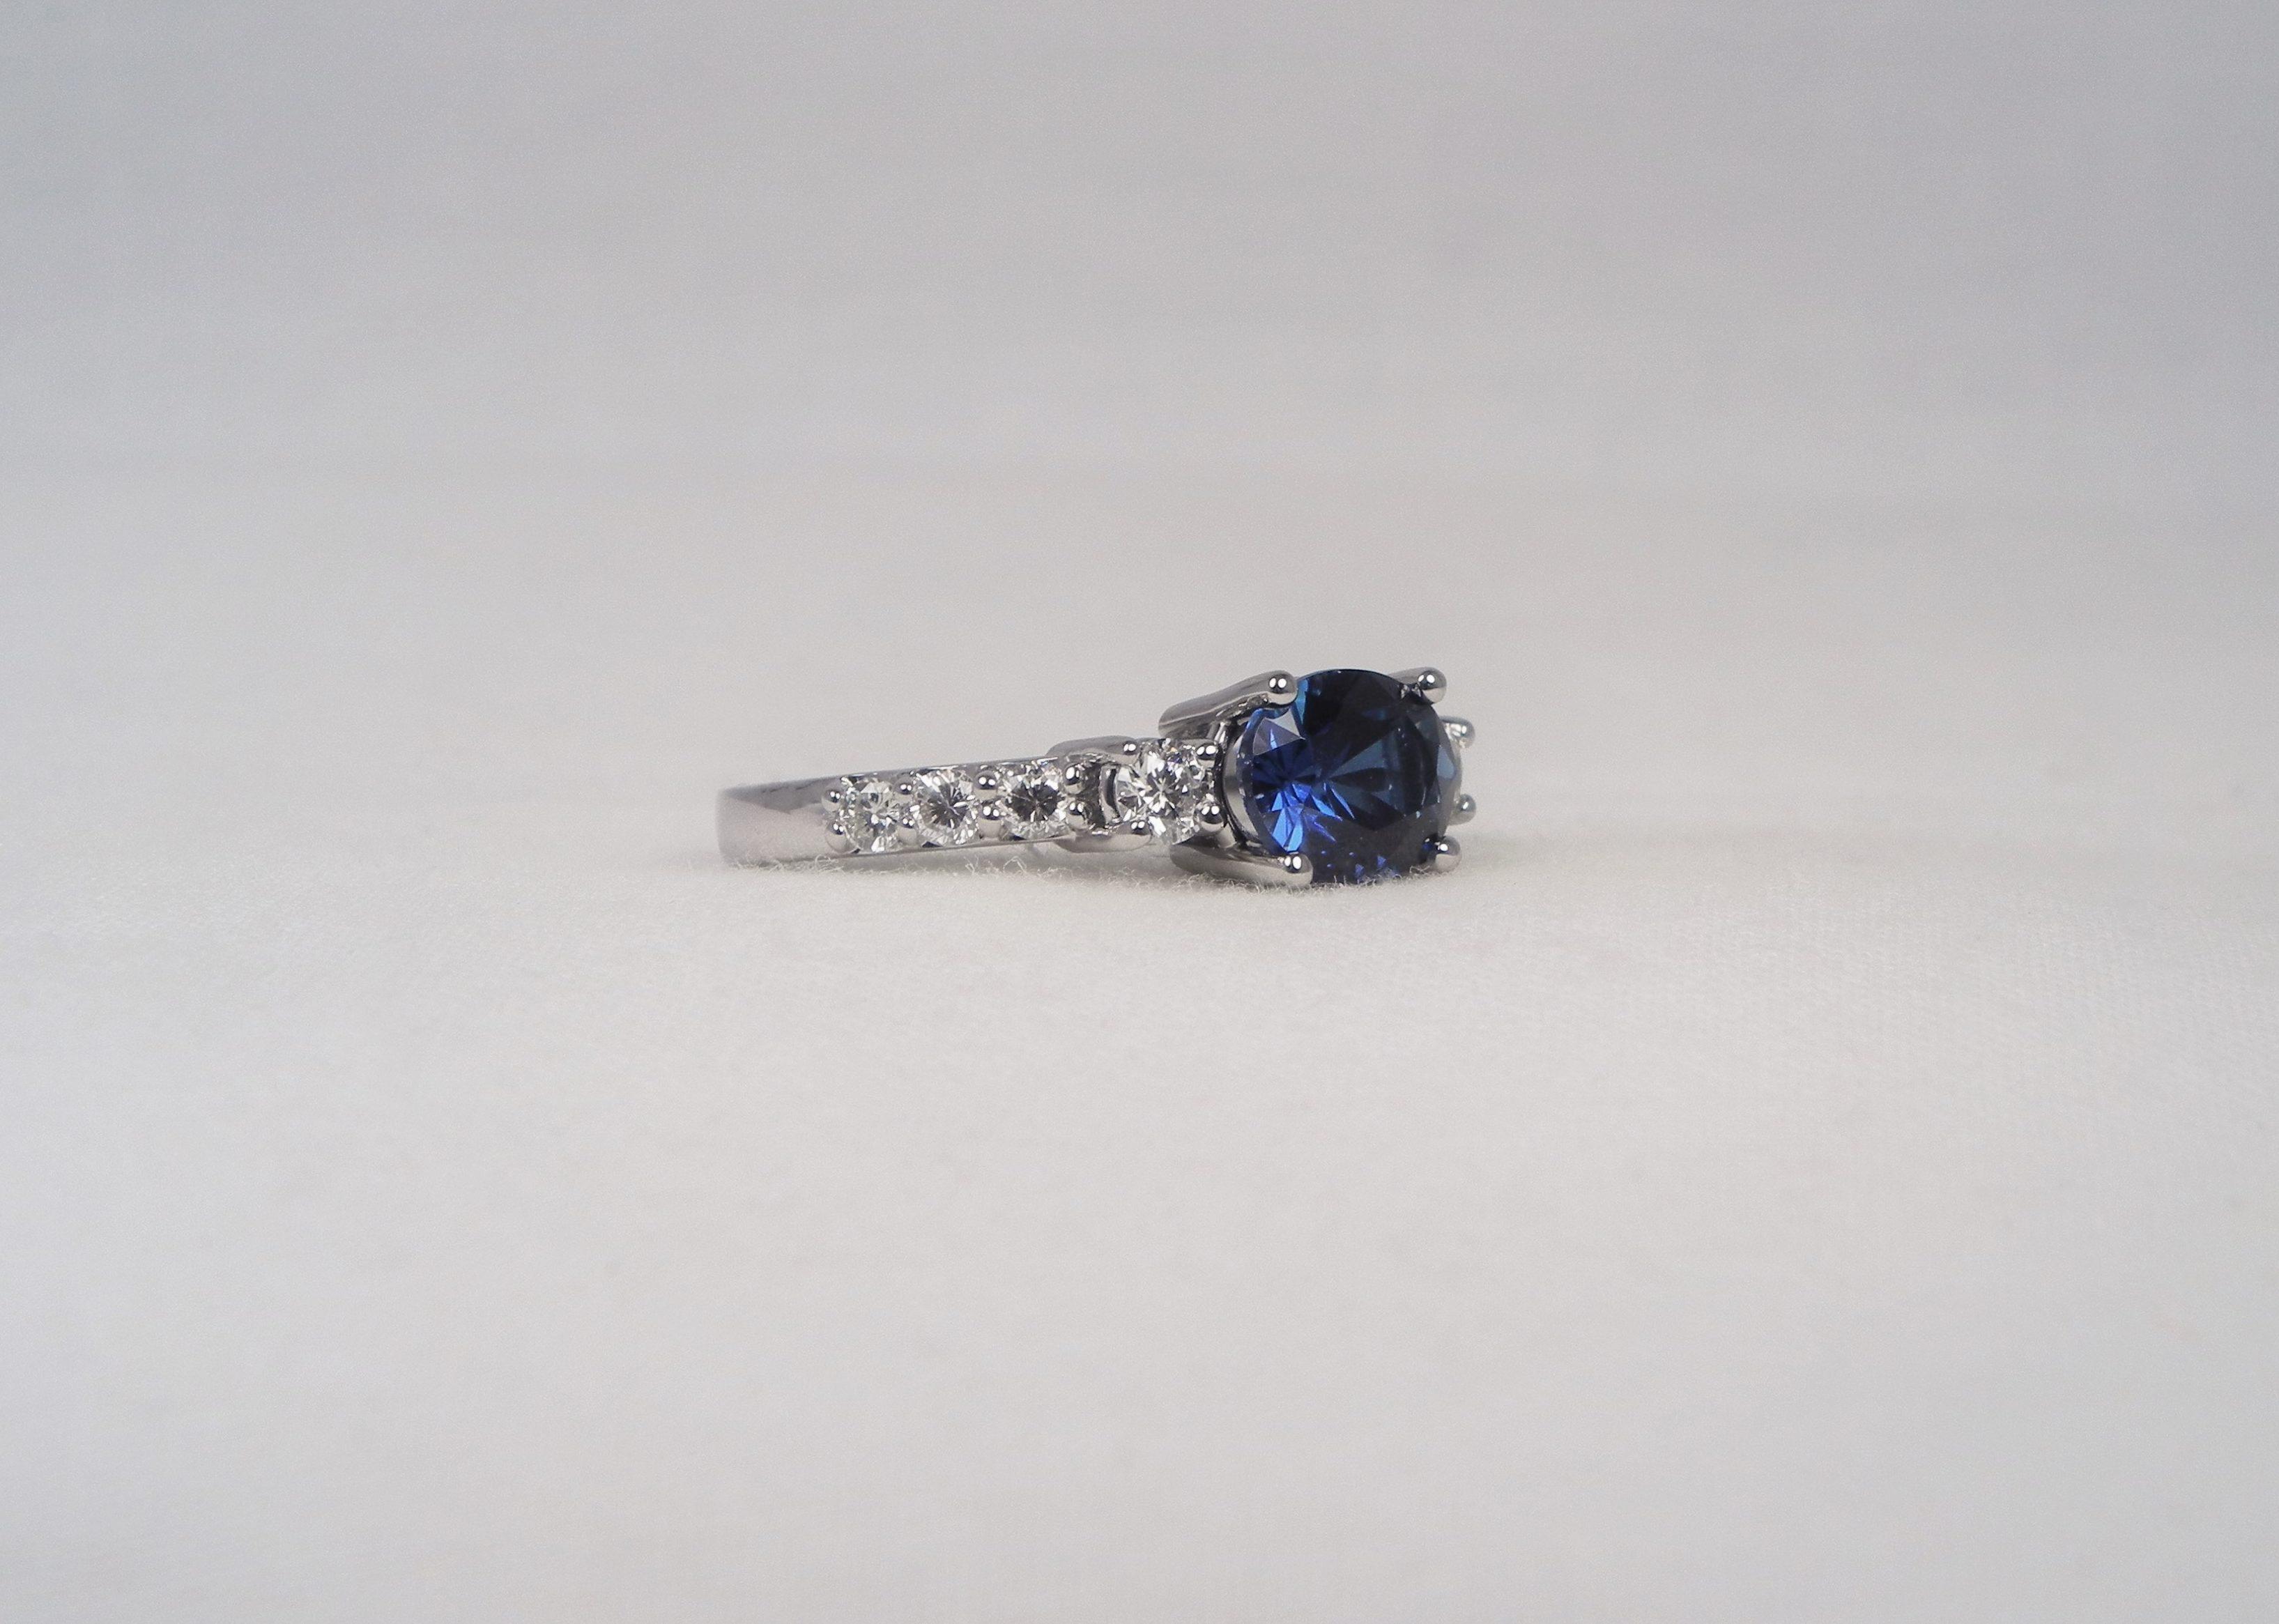 14K White Gold Blue Sapphire And Diamond Ring KT Diamonds